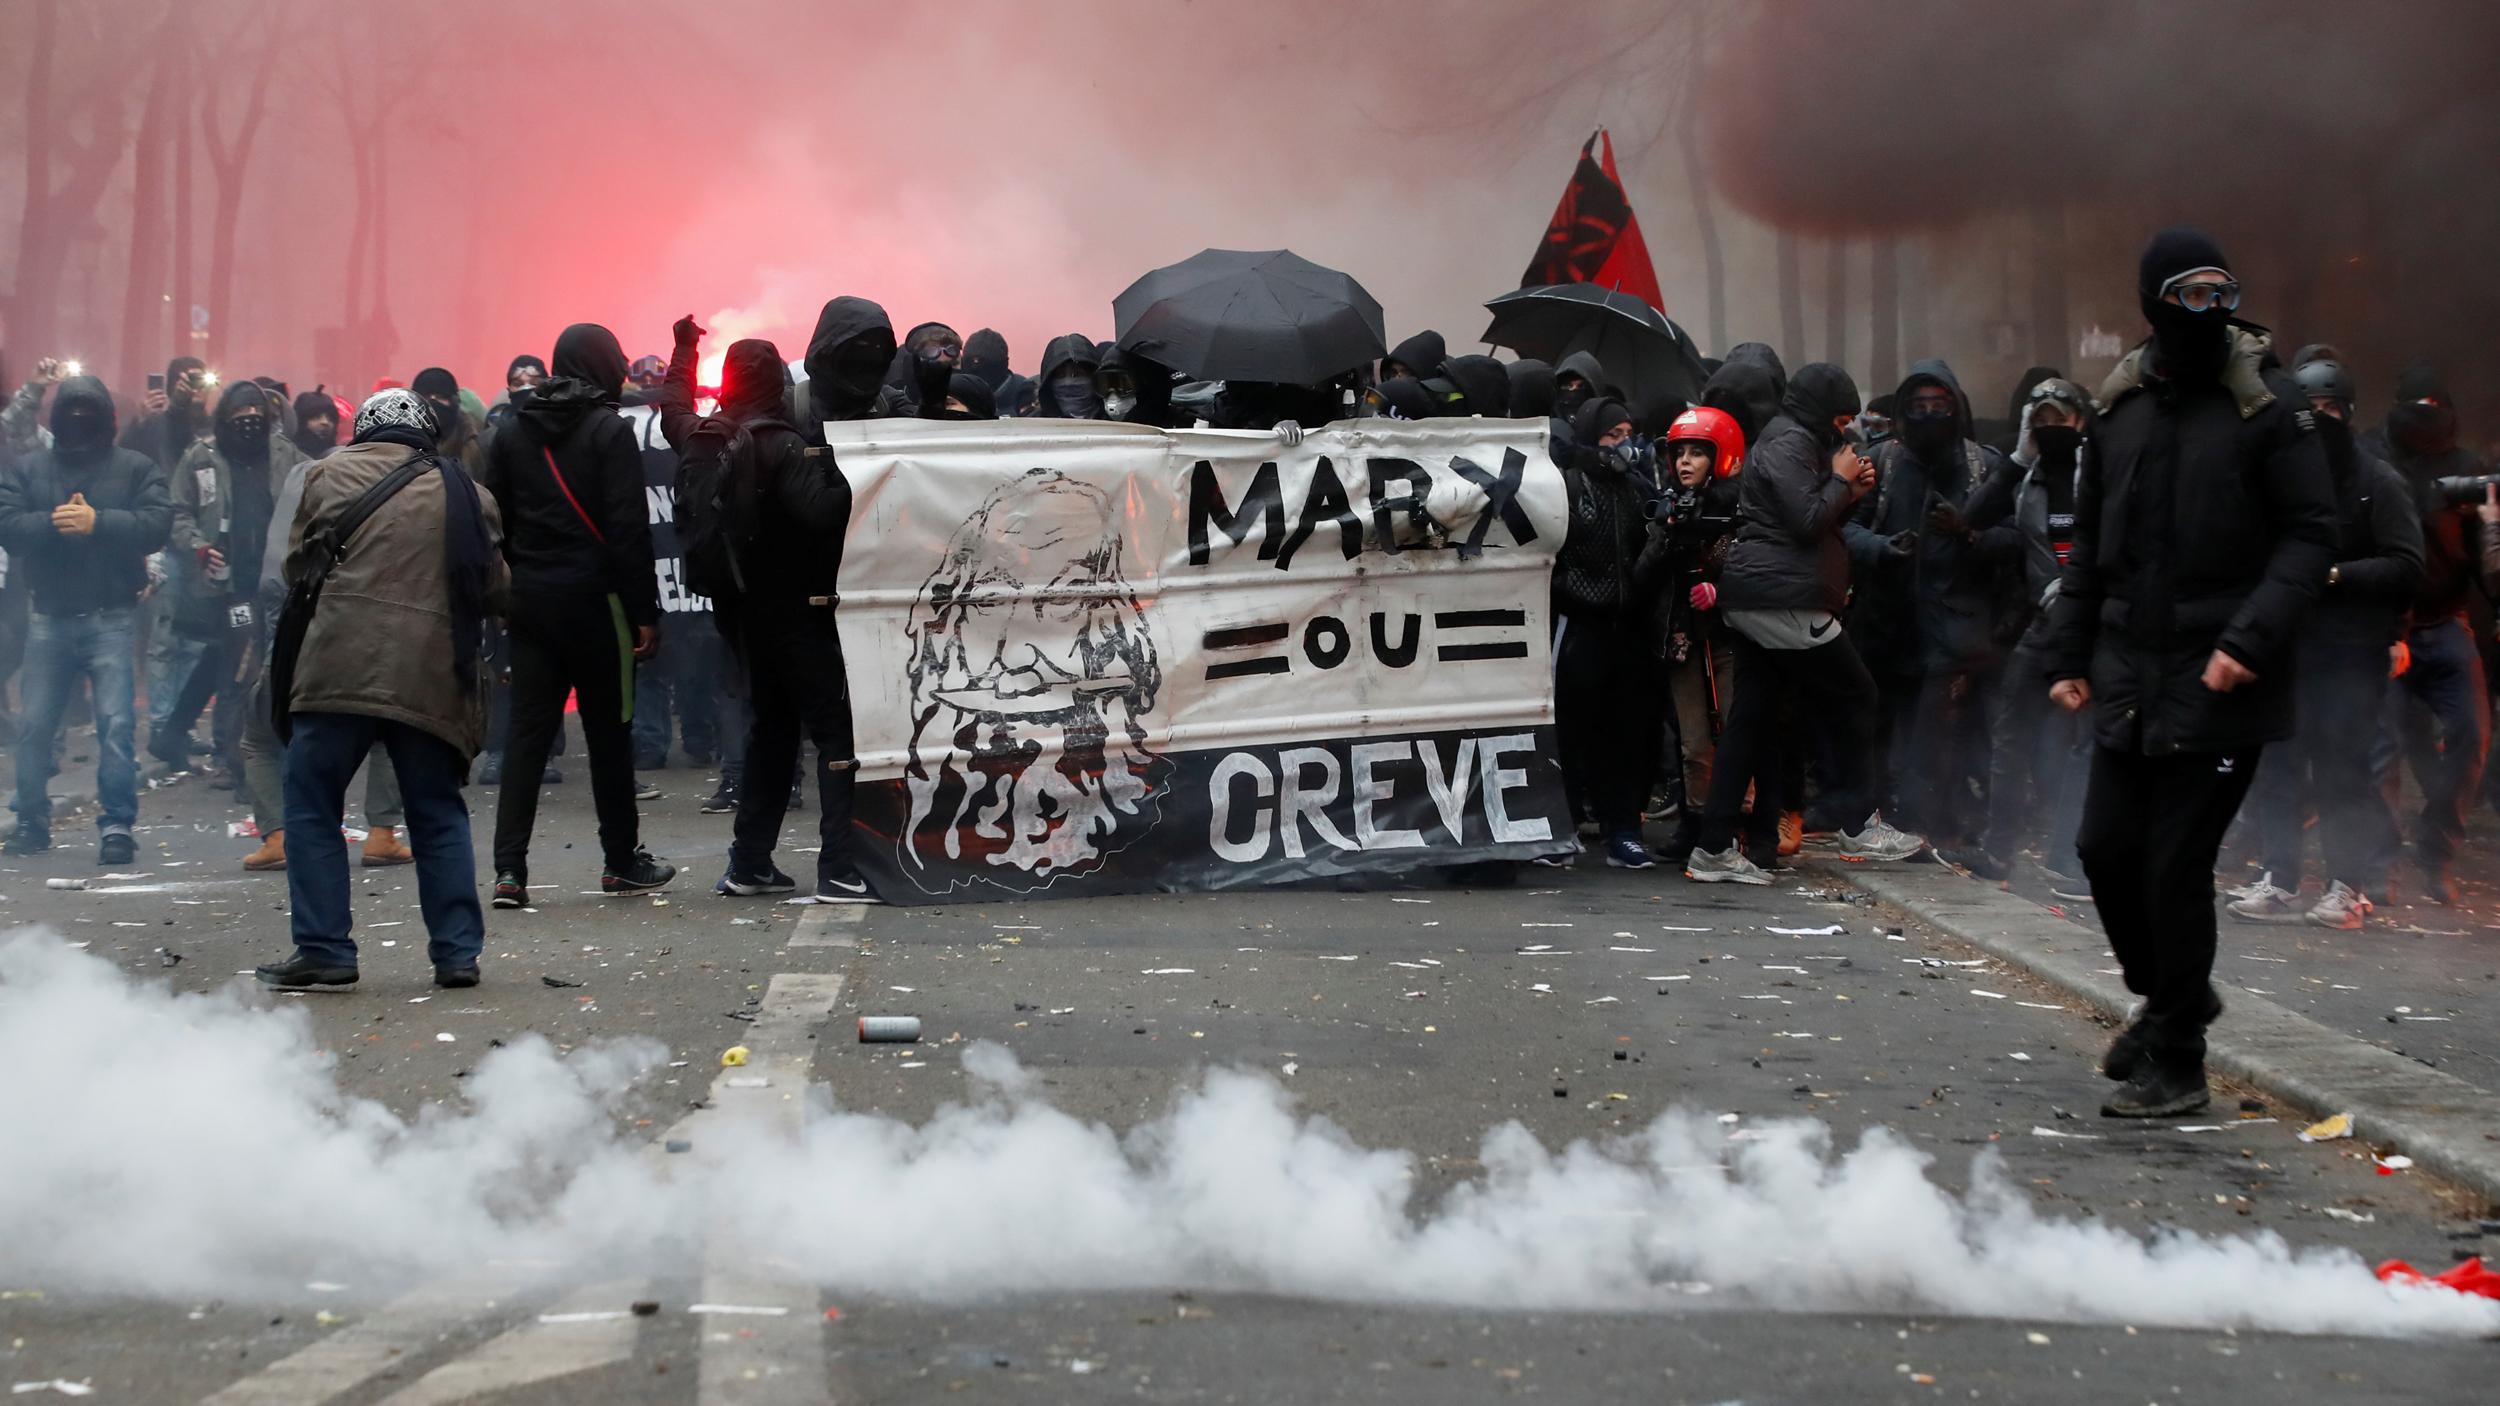 2019-12-05-france-strike-05.jpg